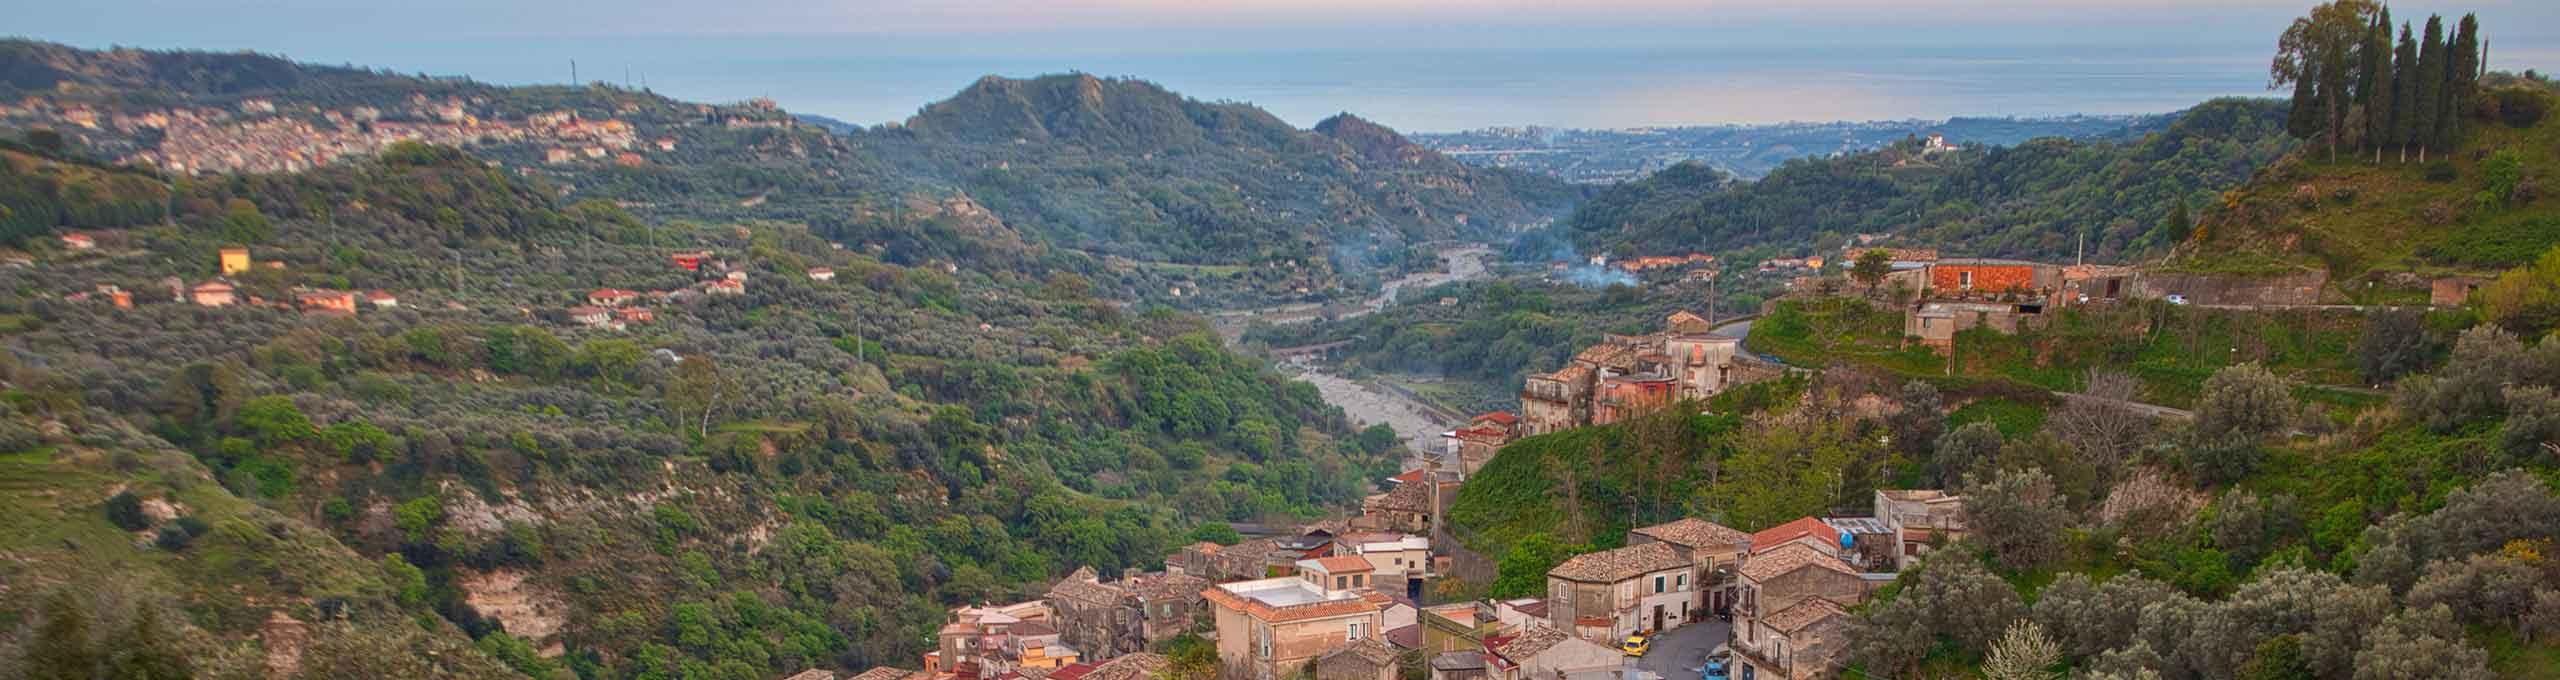 Grotteria, Riviera dei Gelsomini, Calabria